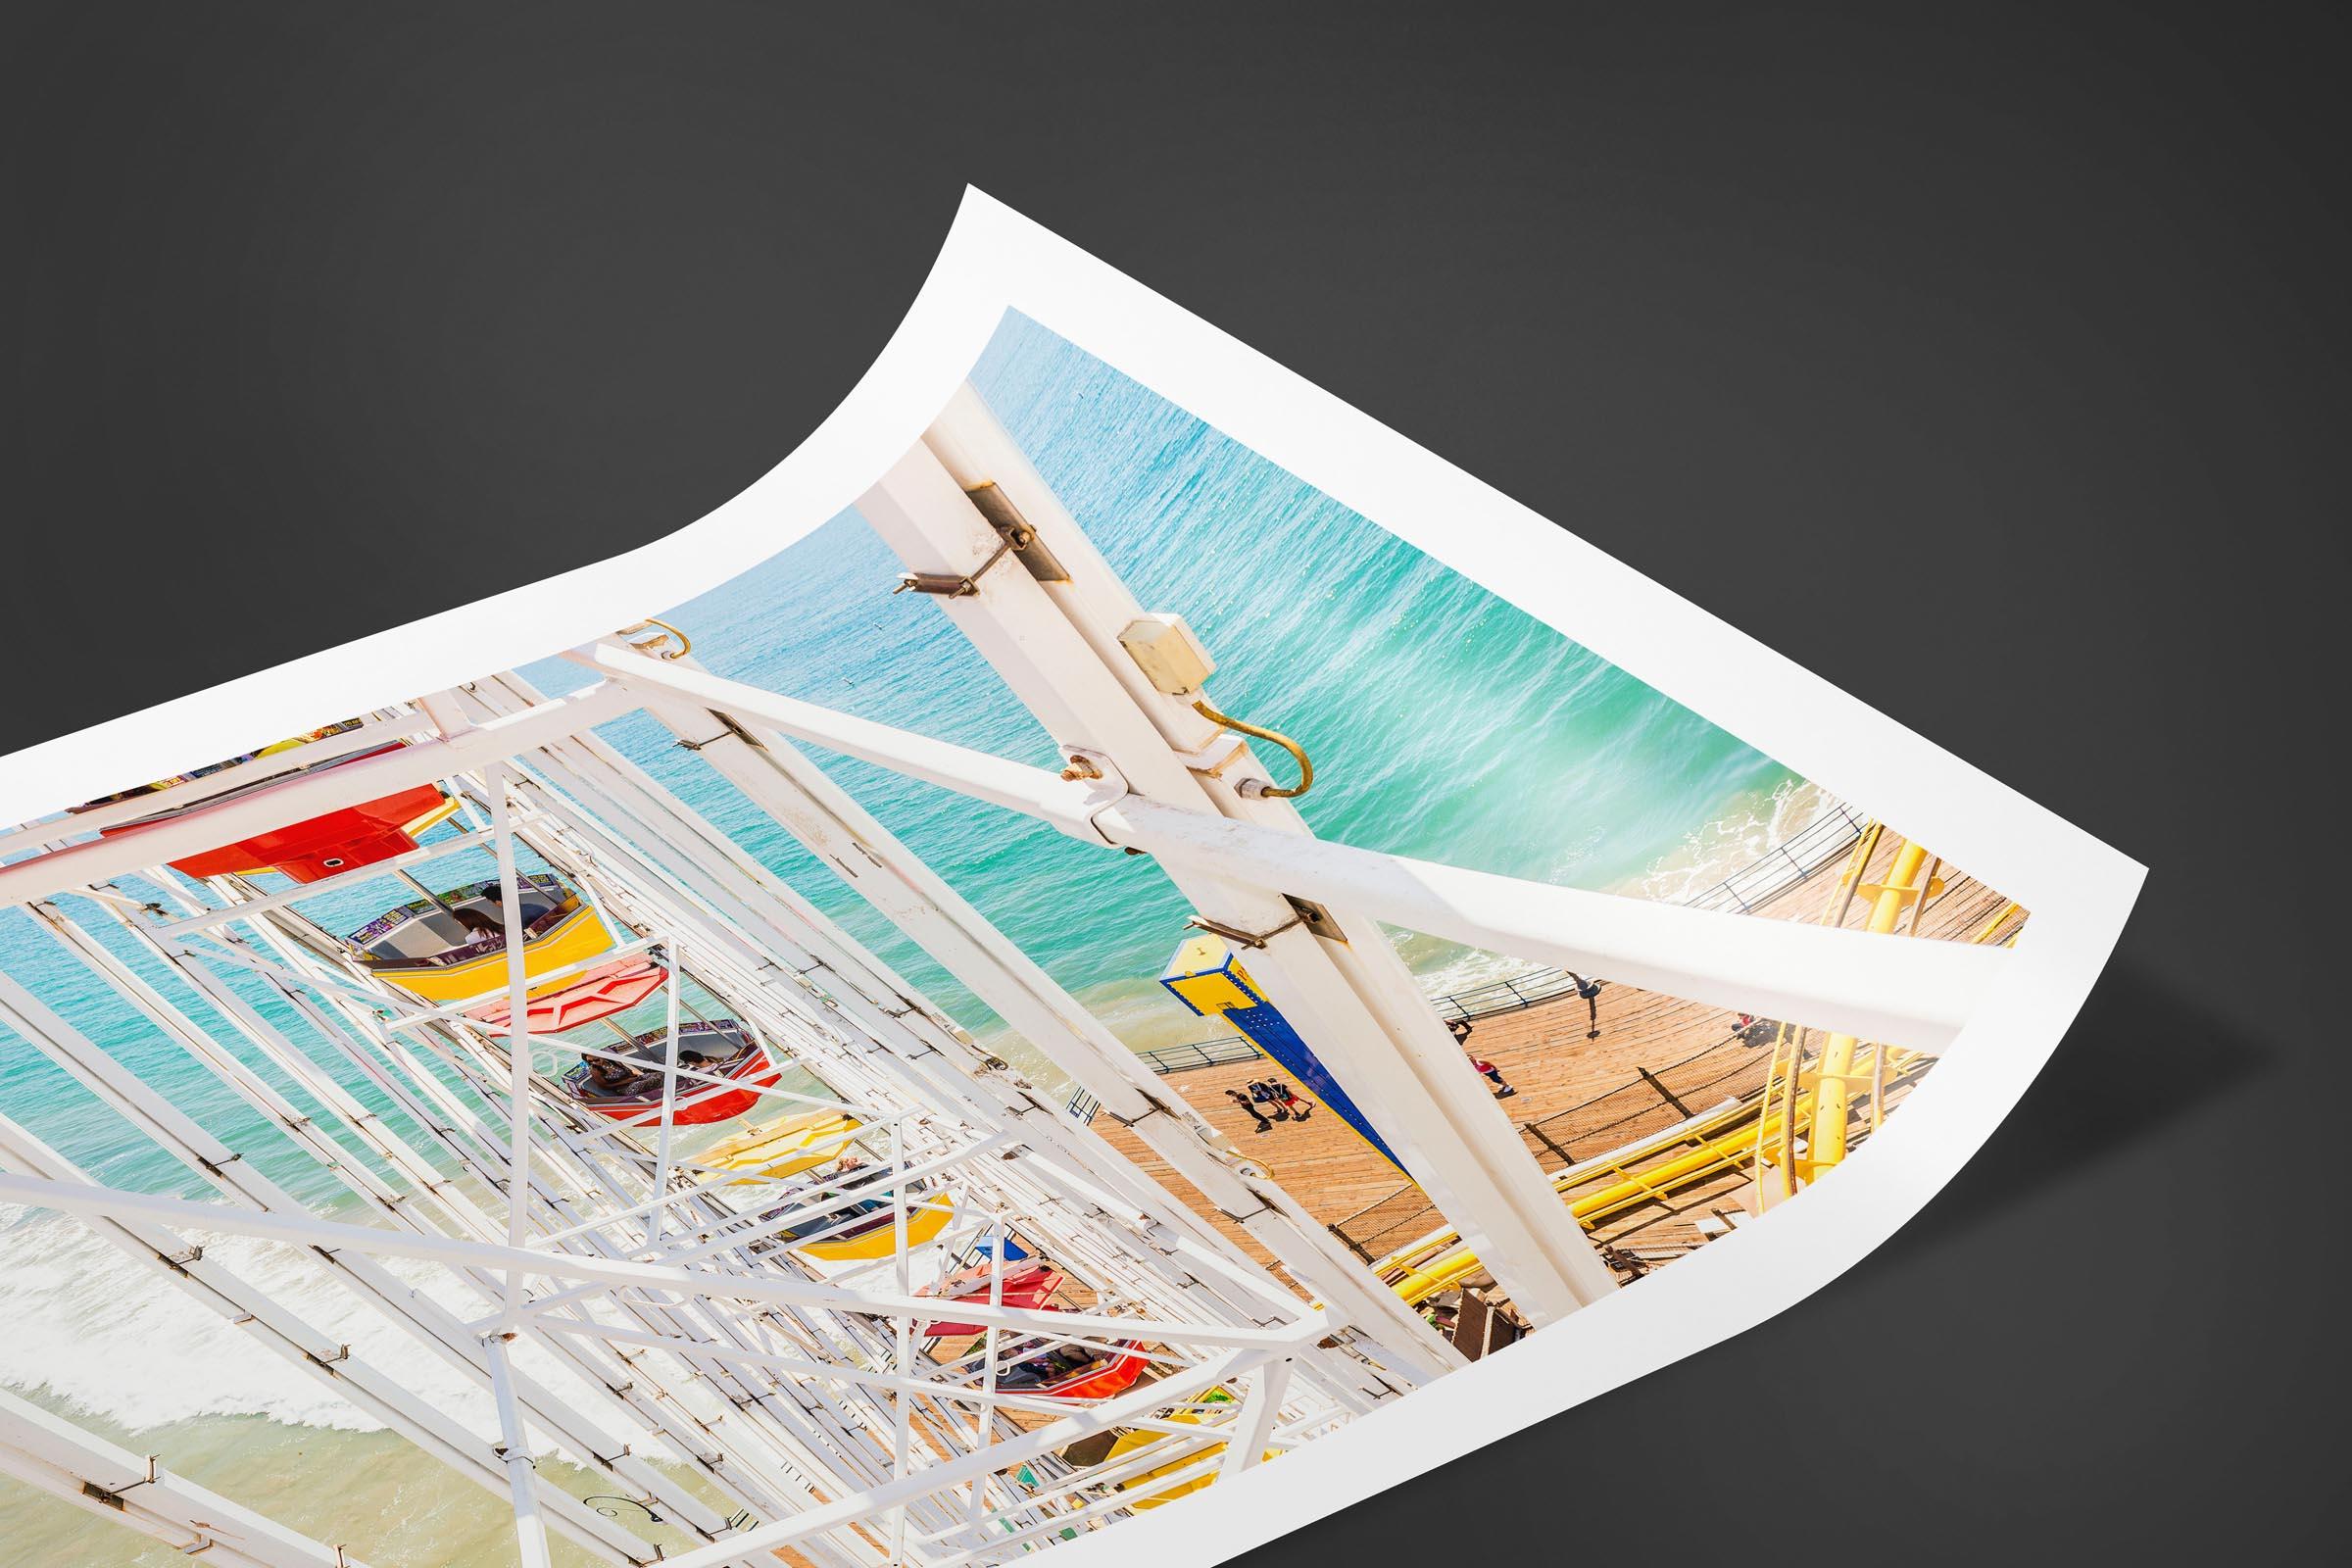 Fine art limited edition print of Ferris Wheel in Santa Monica, California by Brent Goldman Photography